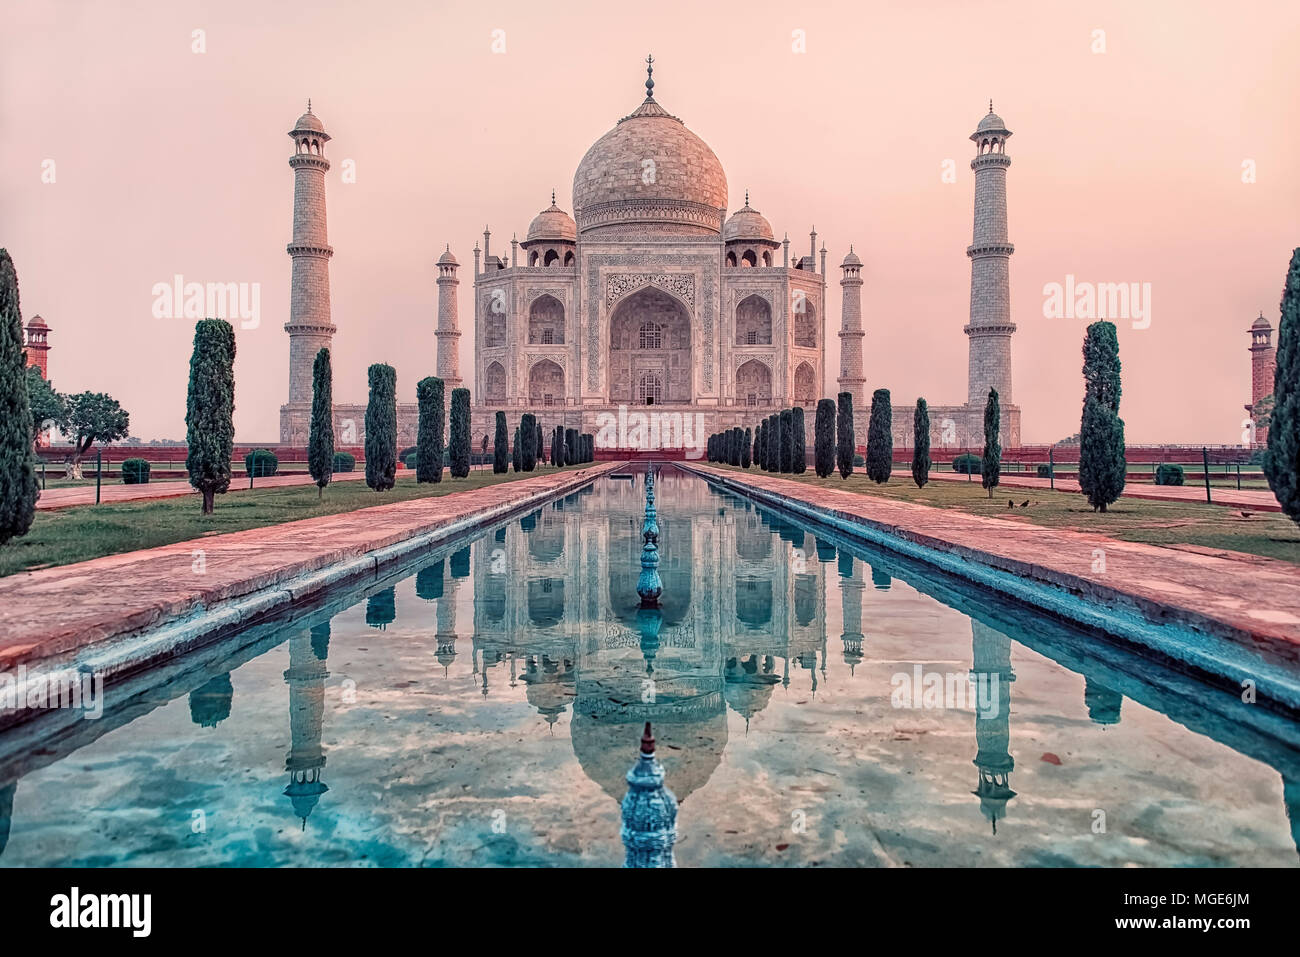 Taj Mahal in sunrise light, Agra, India - Stock Image